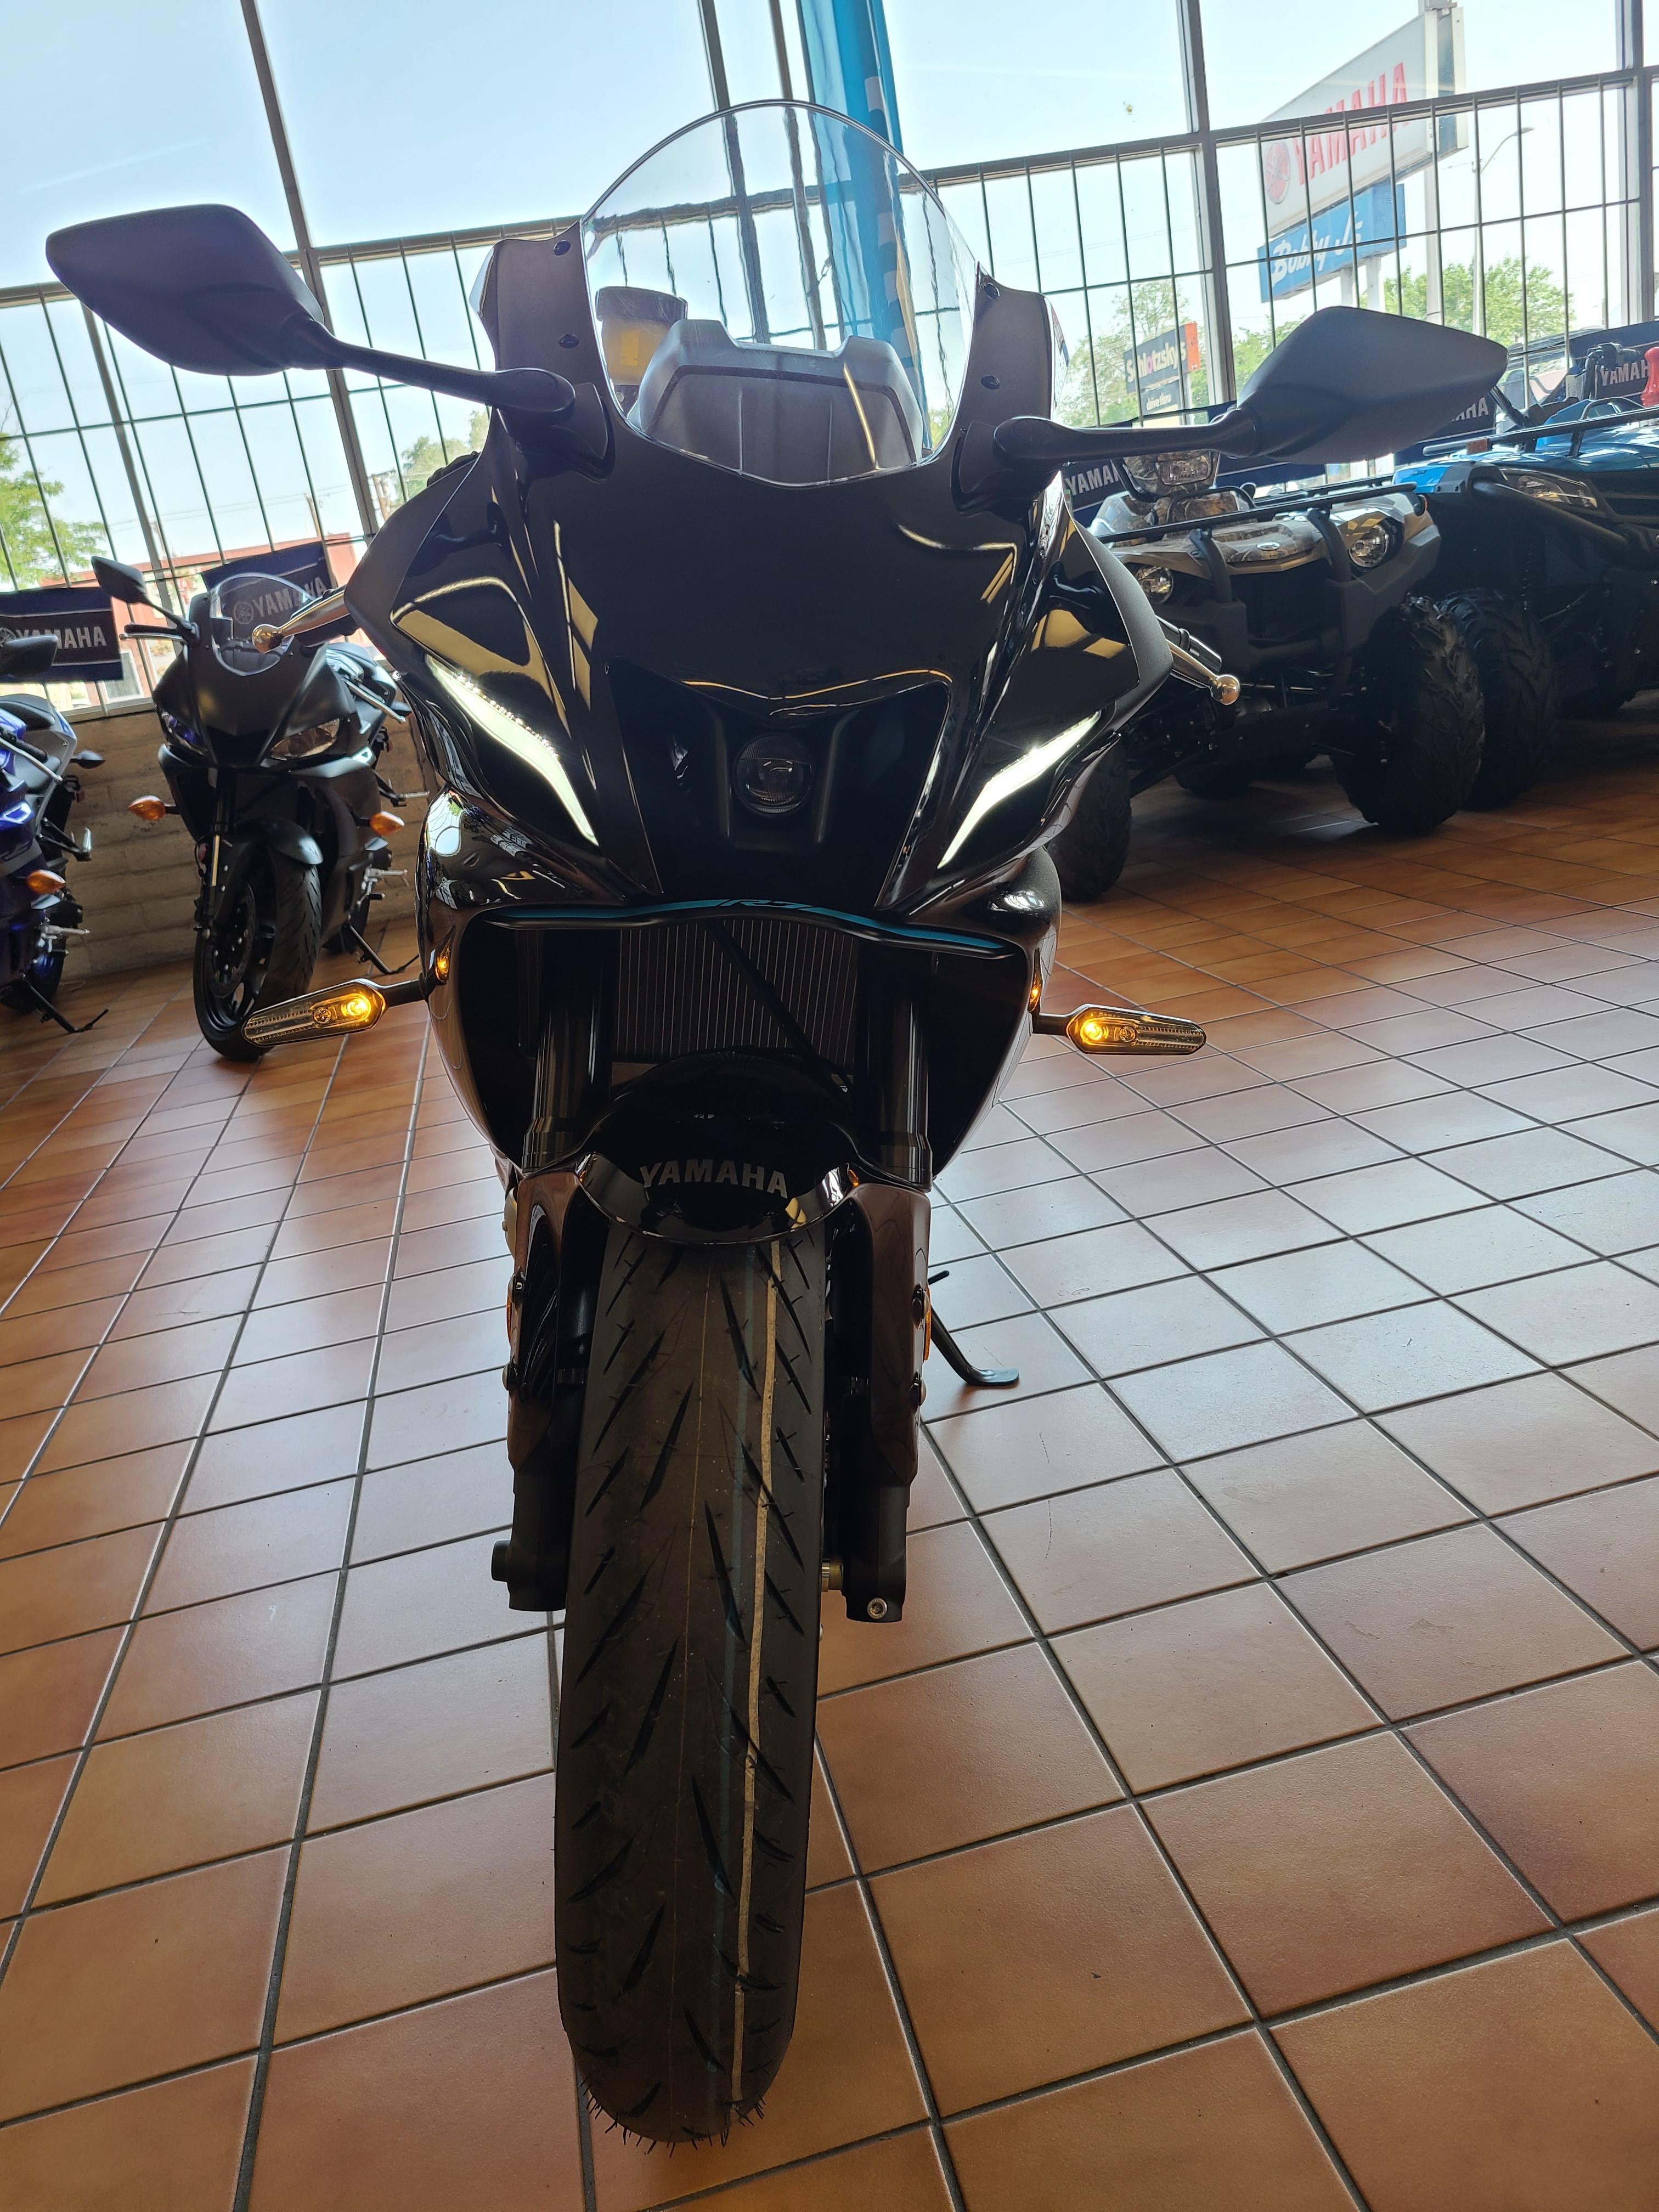 2022 Yamaha YZF R7 at Bobby J's Yamaha, Albuquerque, NM 87110